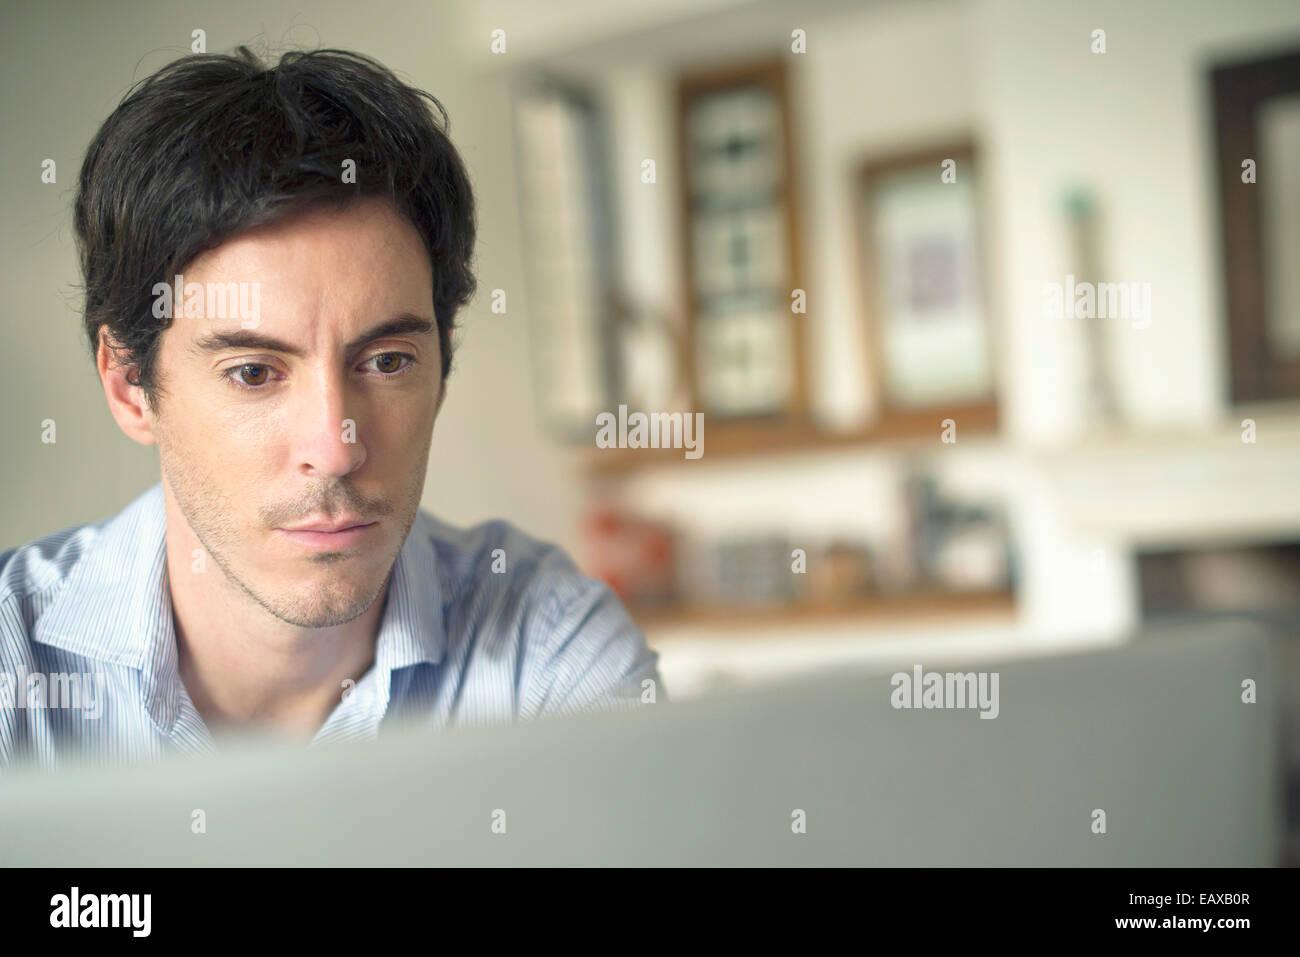 Mann starrte auf Laptop-computer Stockbild